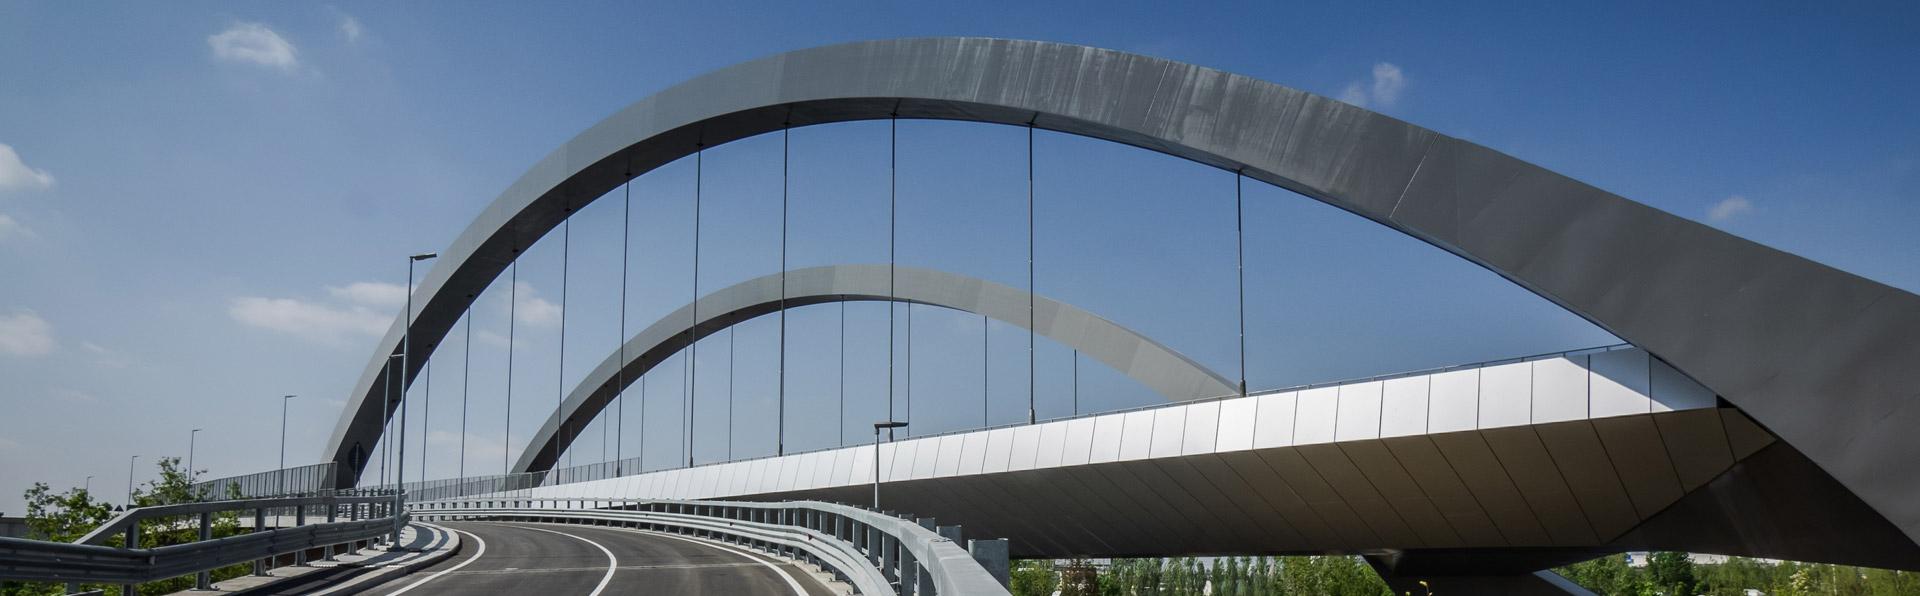 cmb-infrastrutture-infrastructures-milano-area-expo-milan